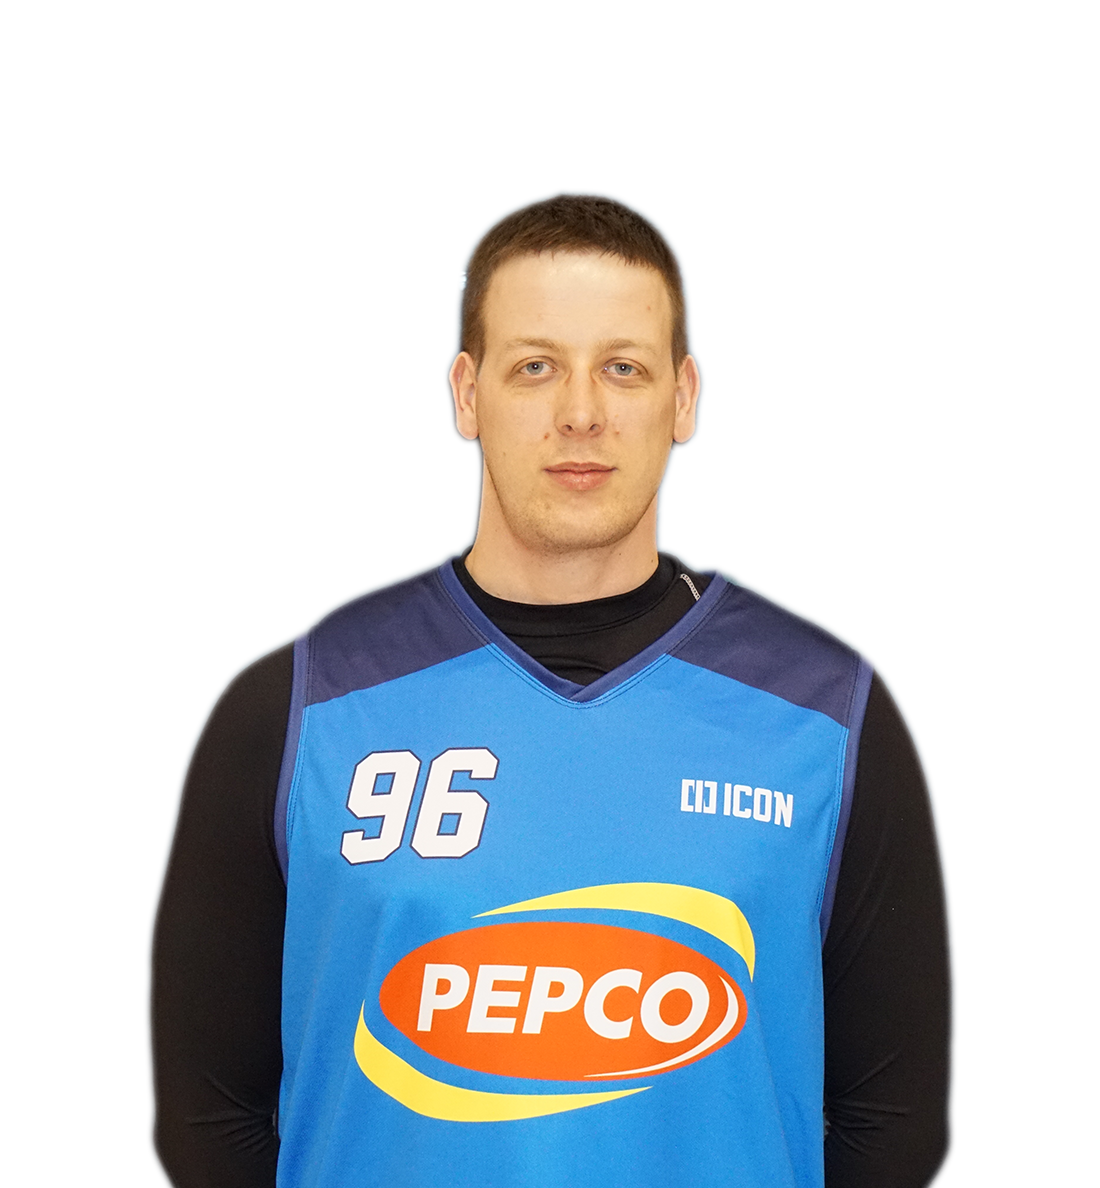 Maciej Gleń